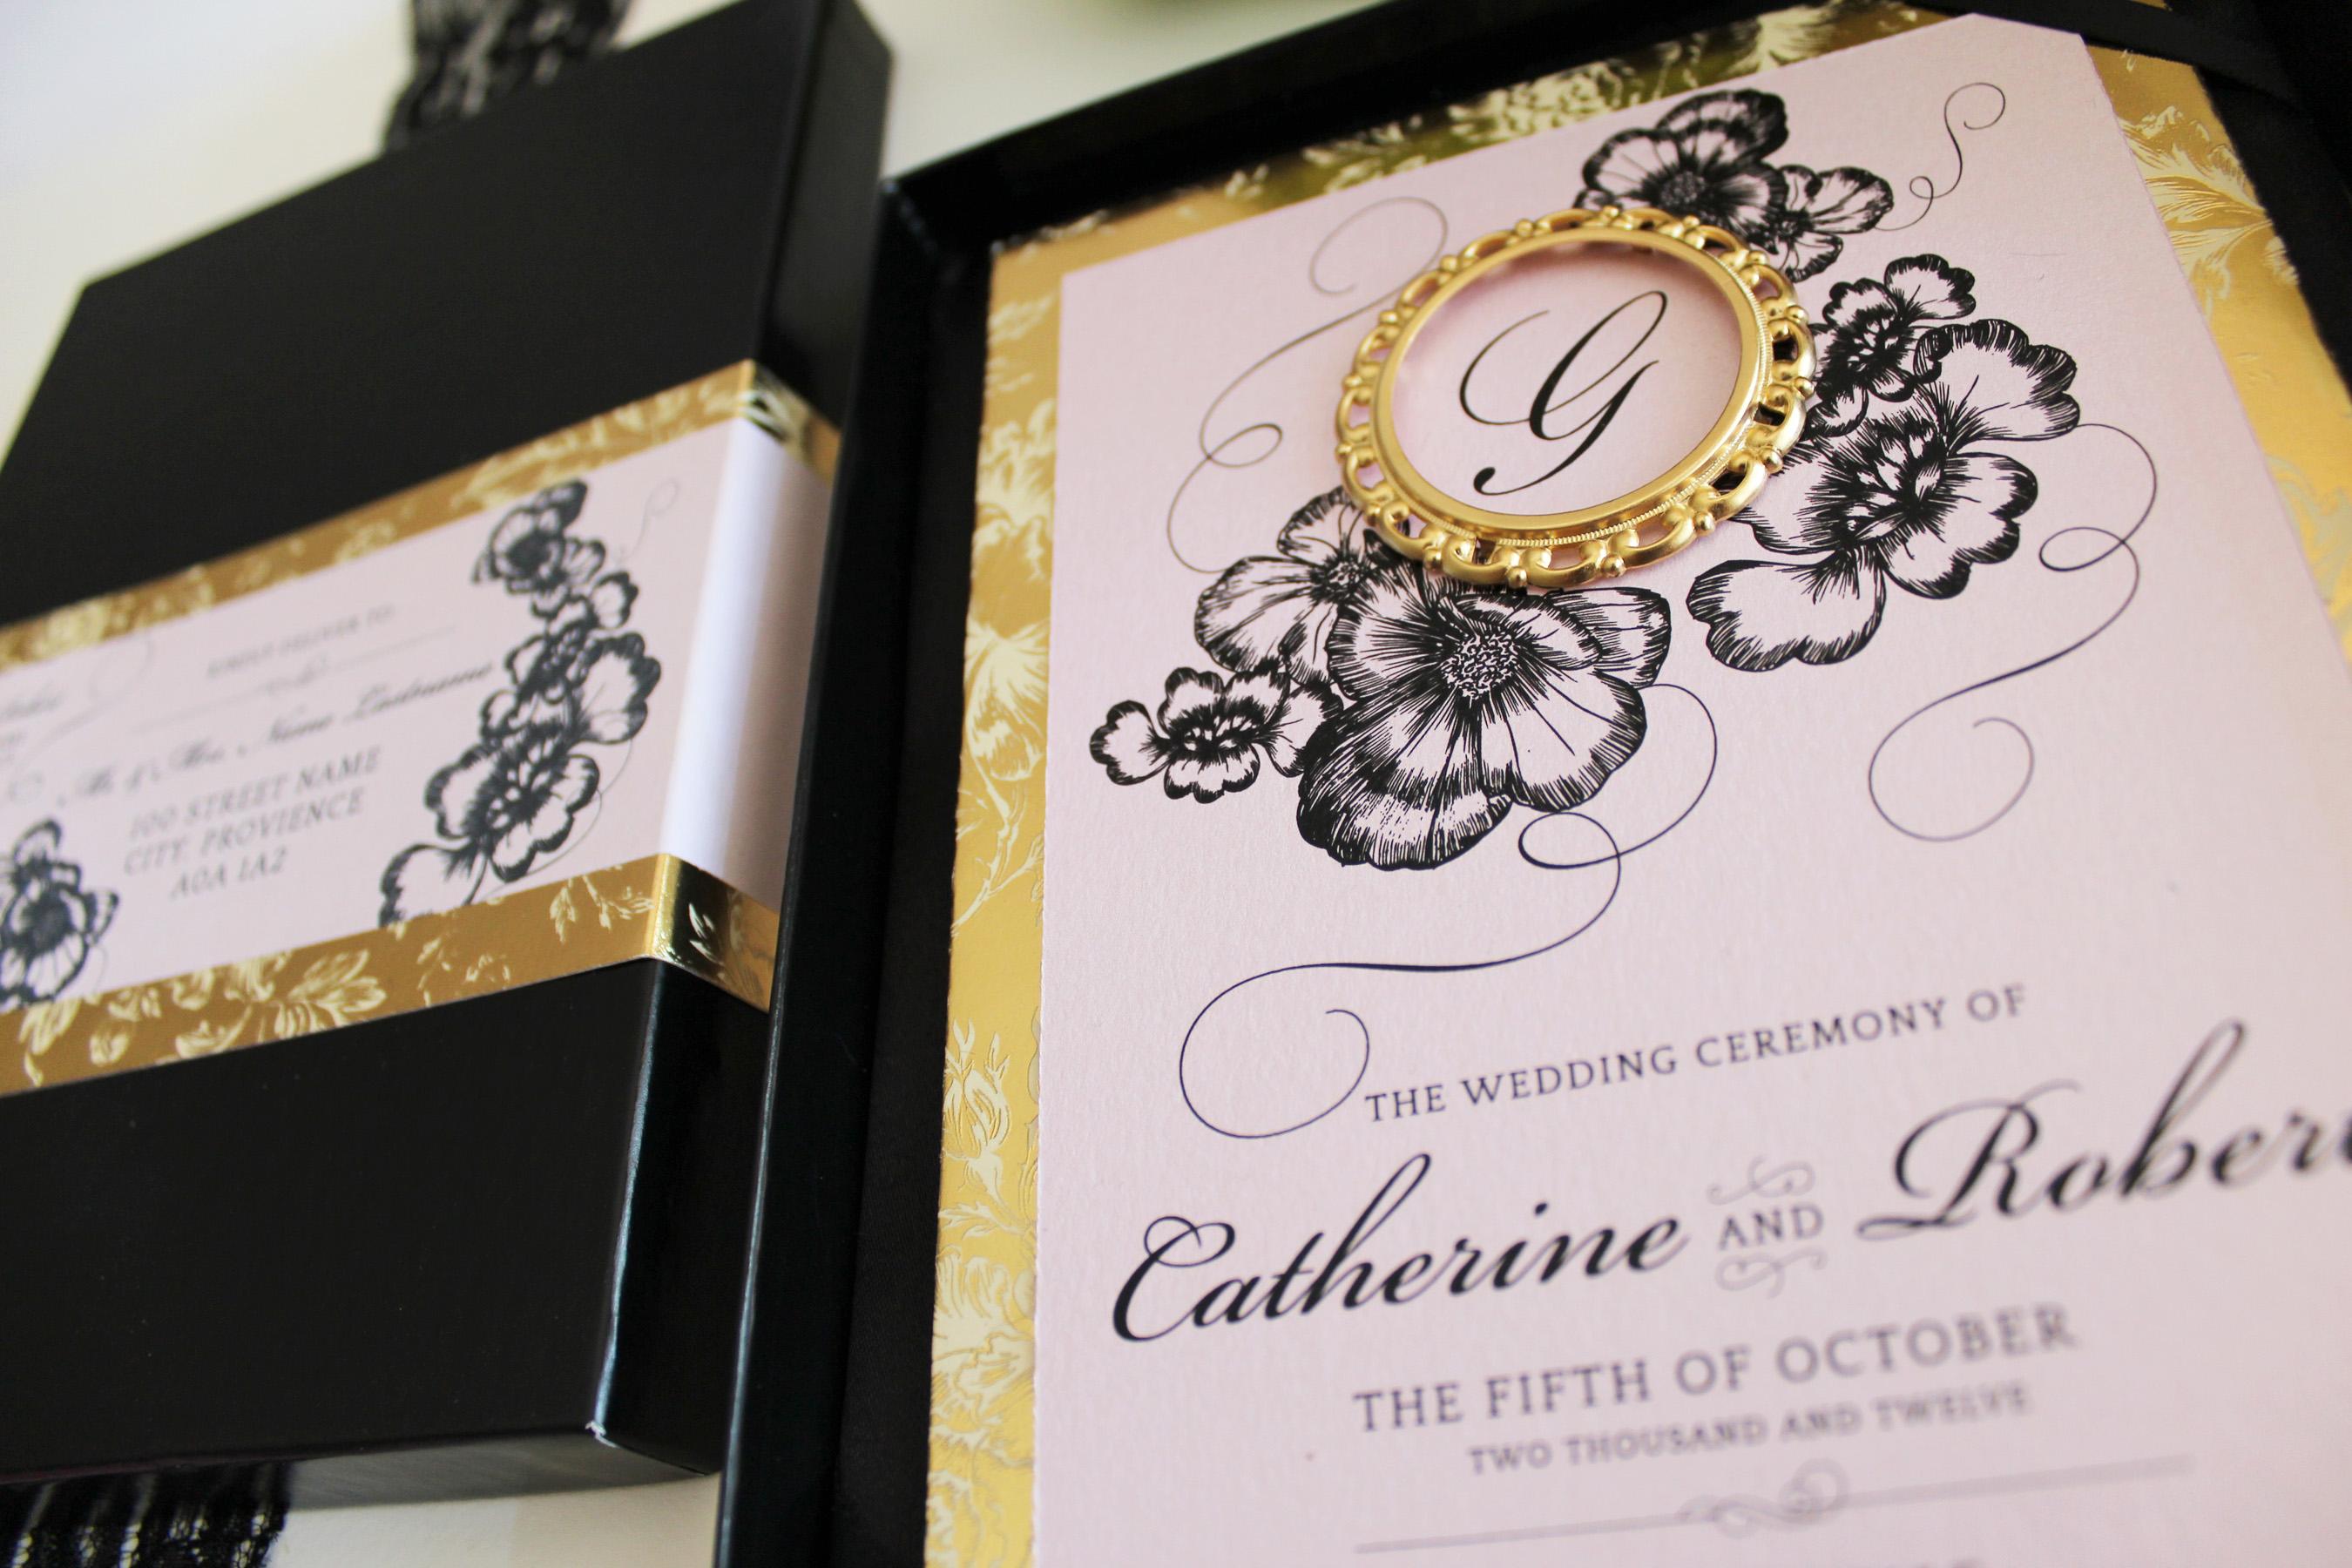 Pink And Black Wedding Invitations: Blush Pink, Gold And Black Boxed Wedding Invitation